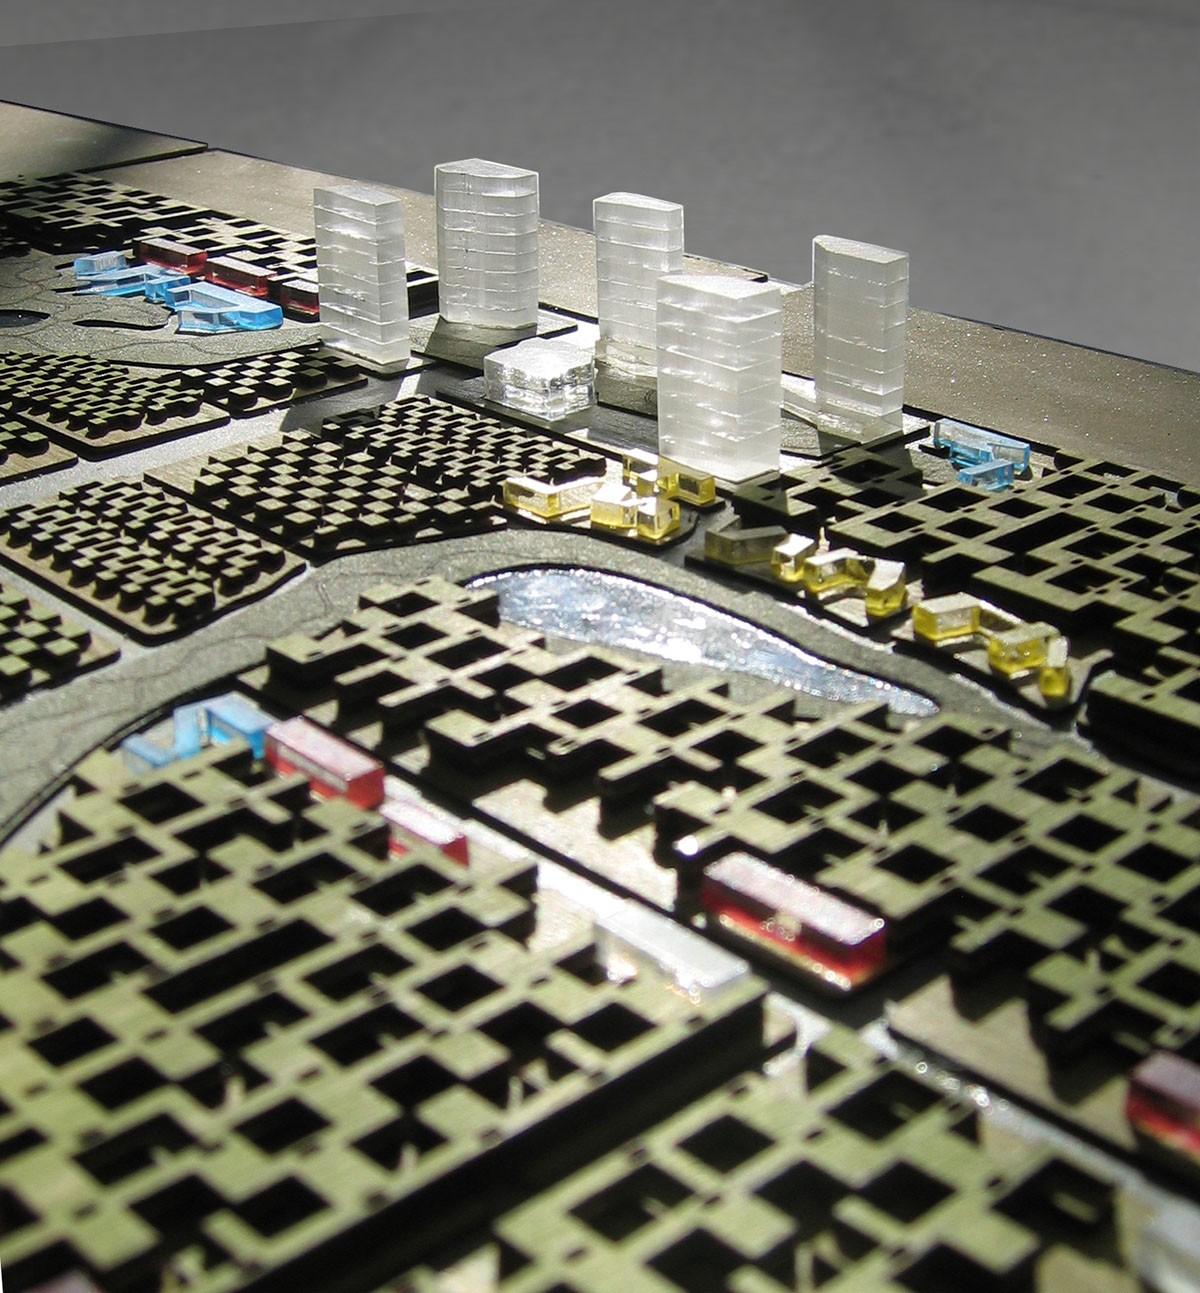 https://stevenholl.sfo2.digitaloceanspaces.com/uploads/projects/project-images/Picture 016.jpg